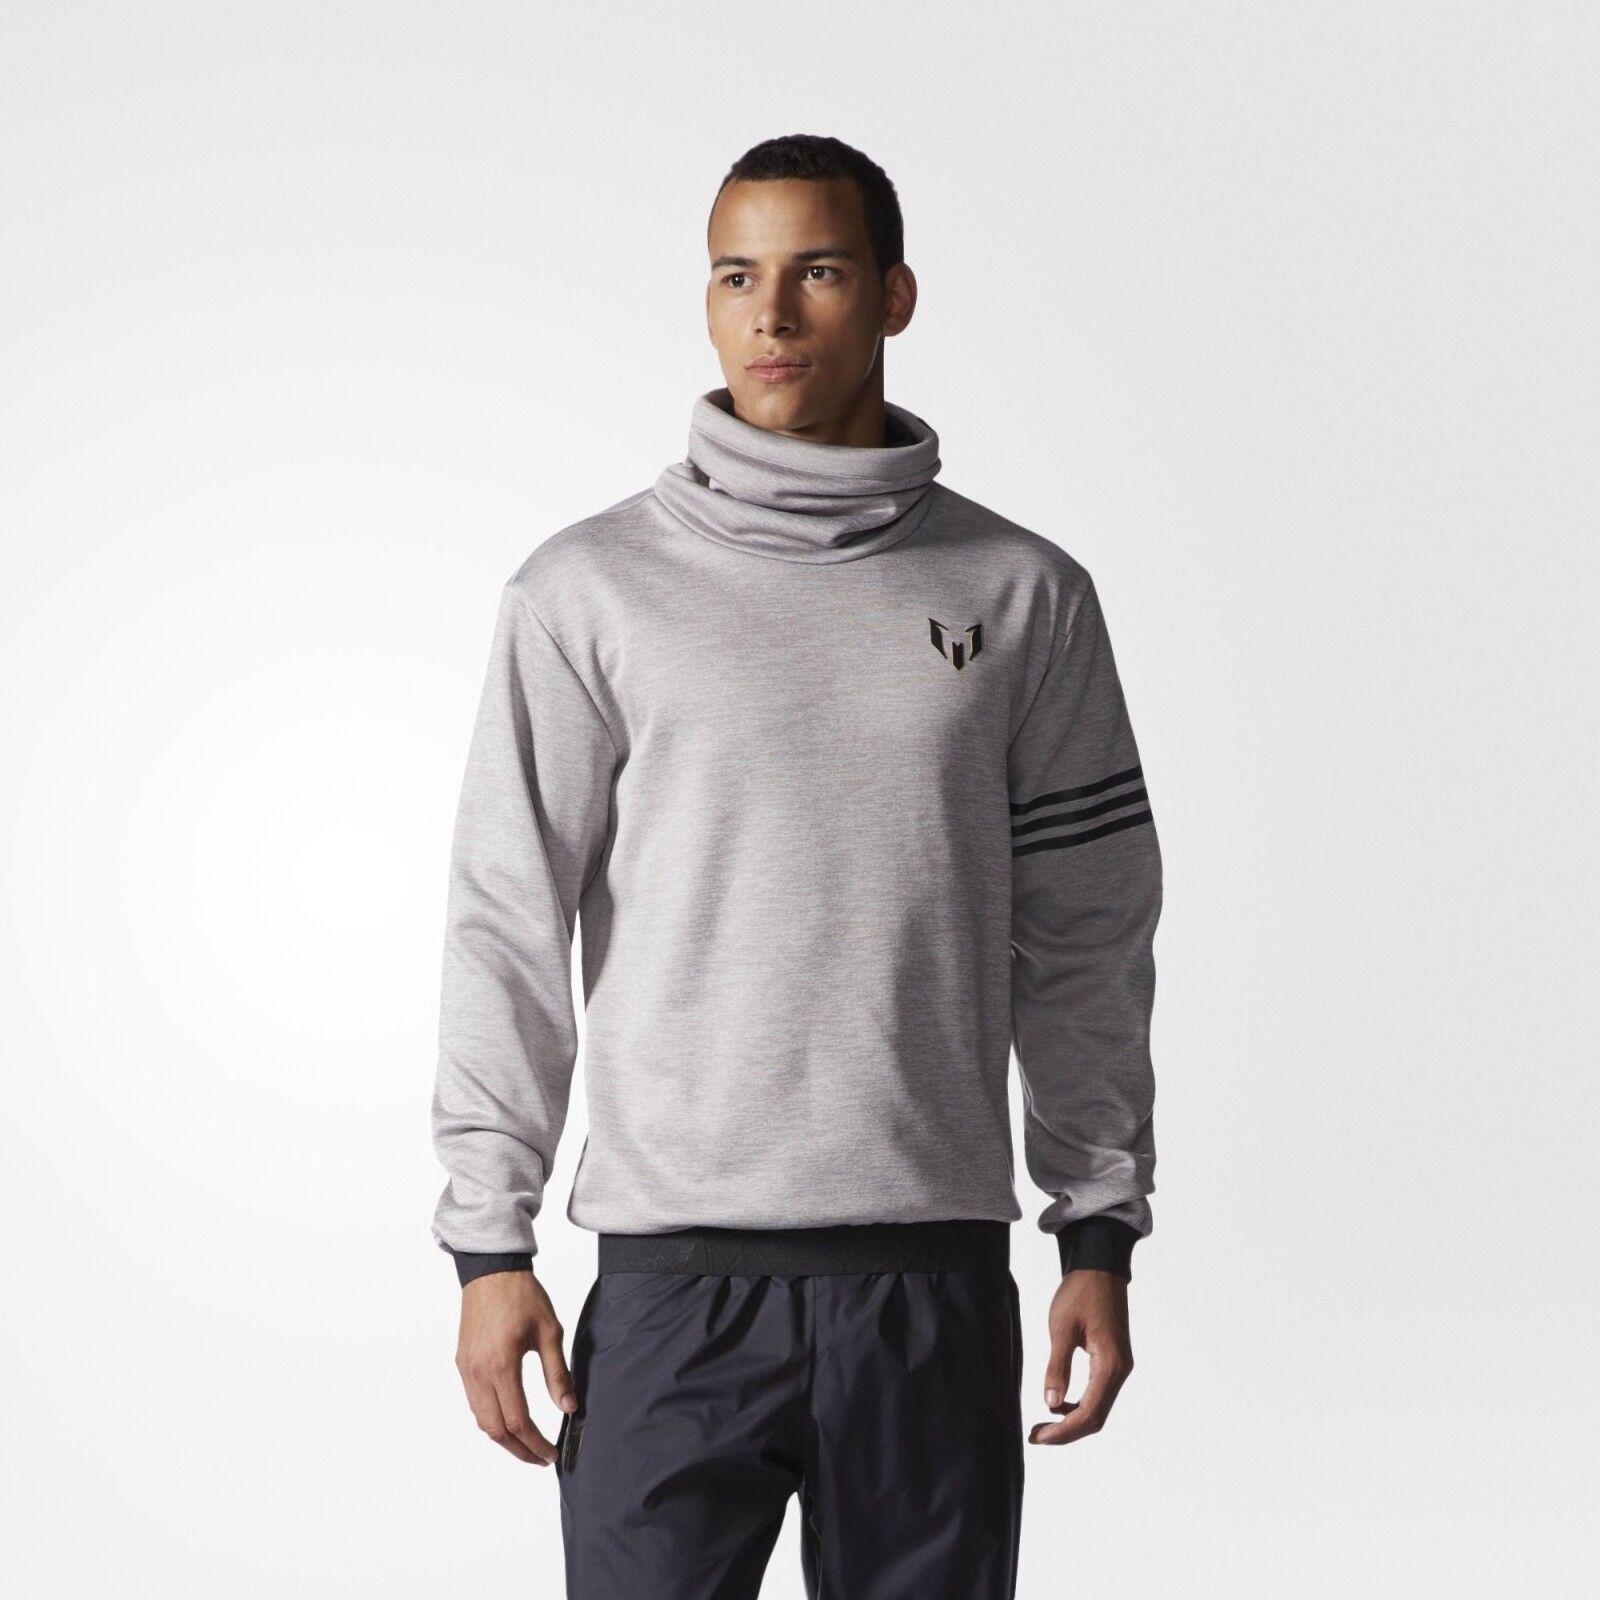 Adidas Mens Messi Football Training Top Jumper Sweatshirt Grey Size Small NEW